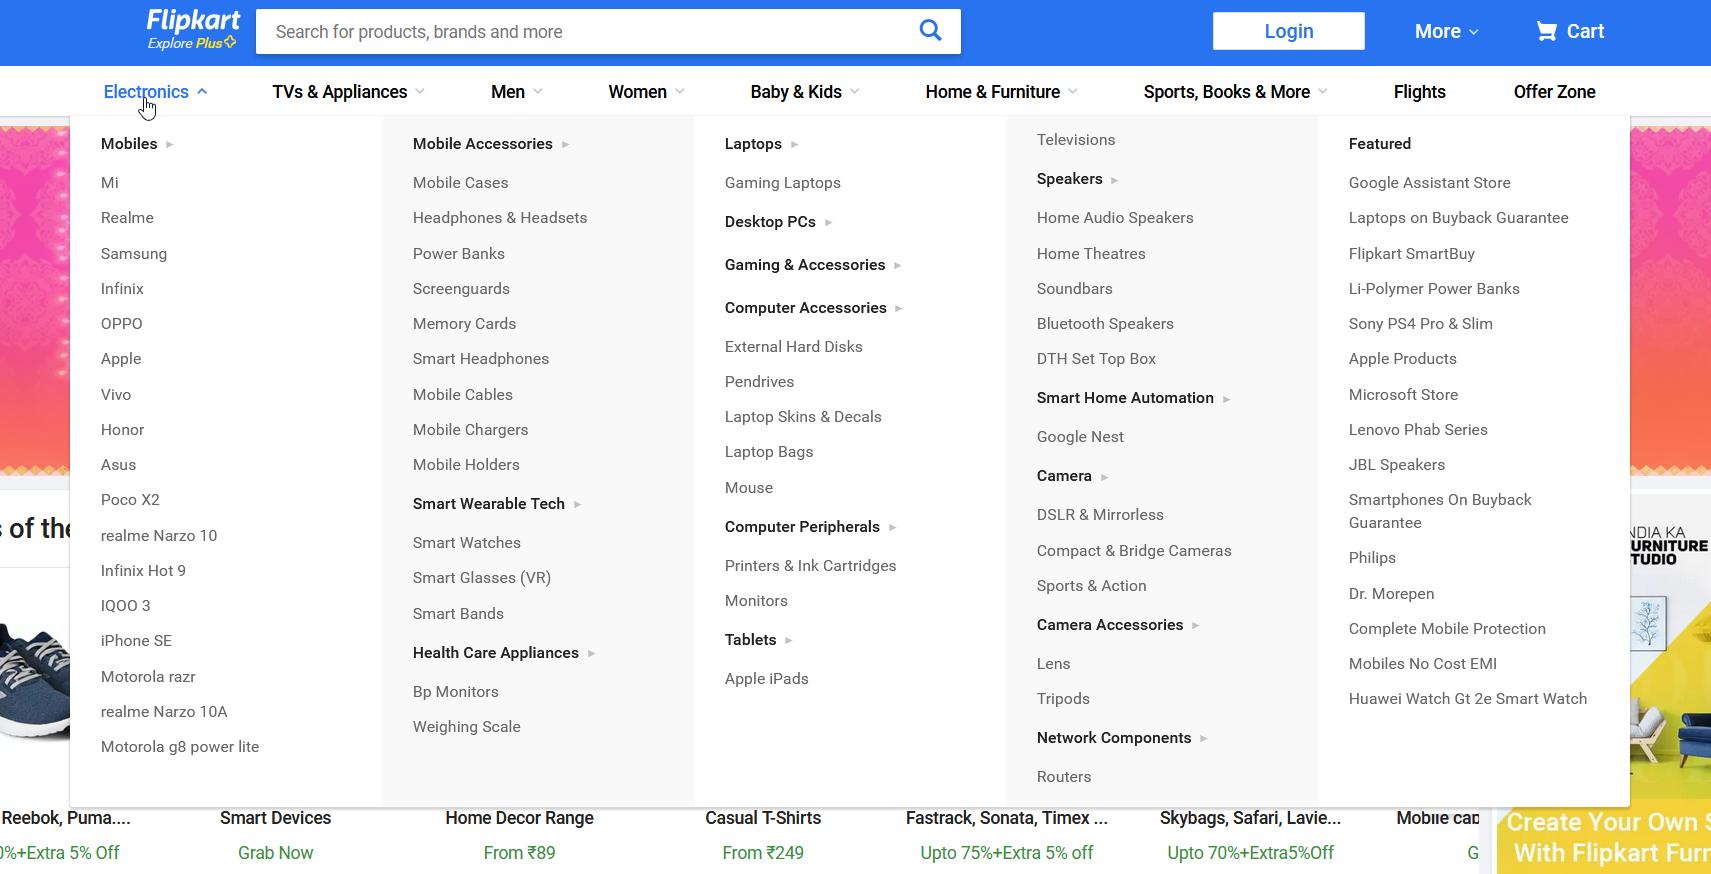 Flipkart.com menu